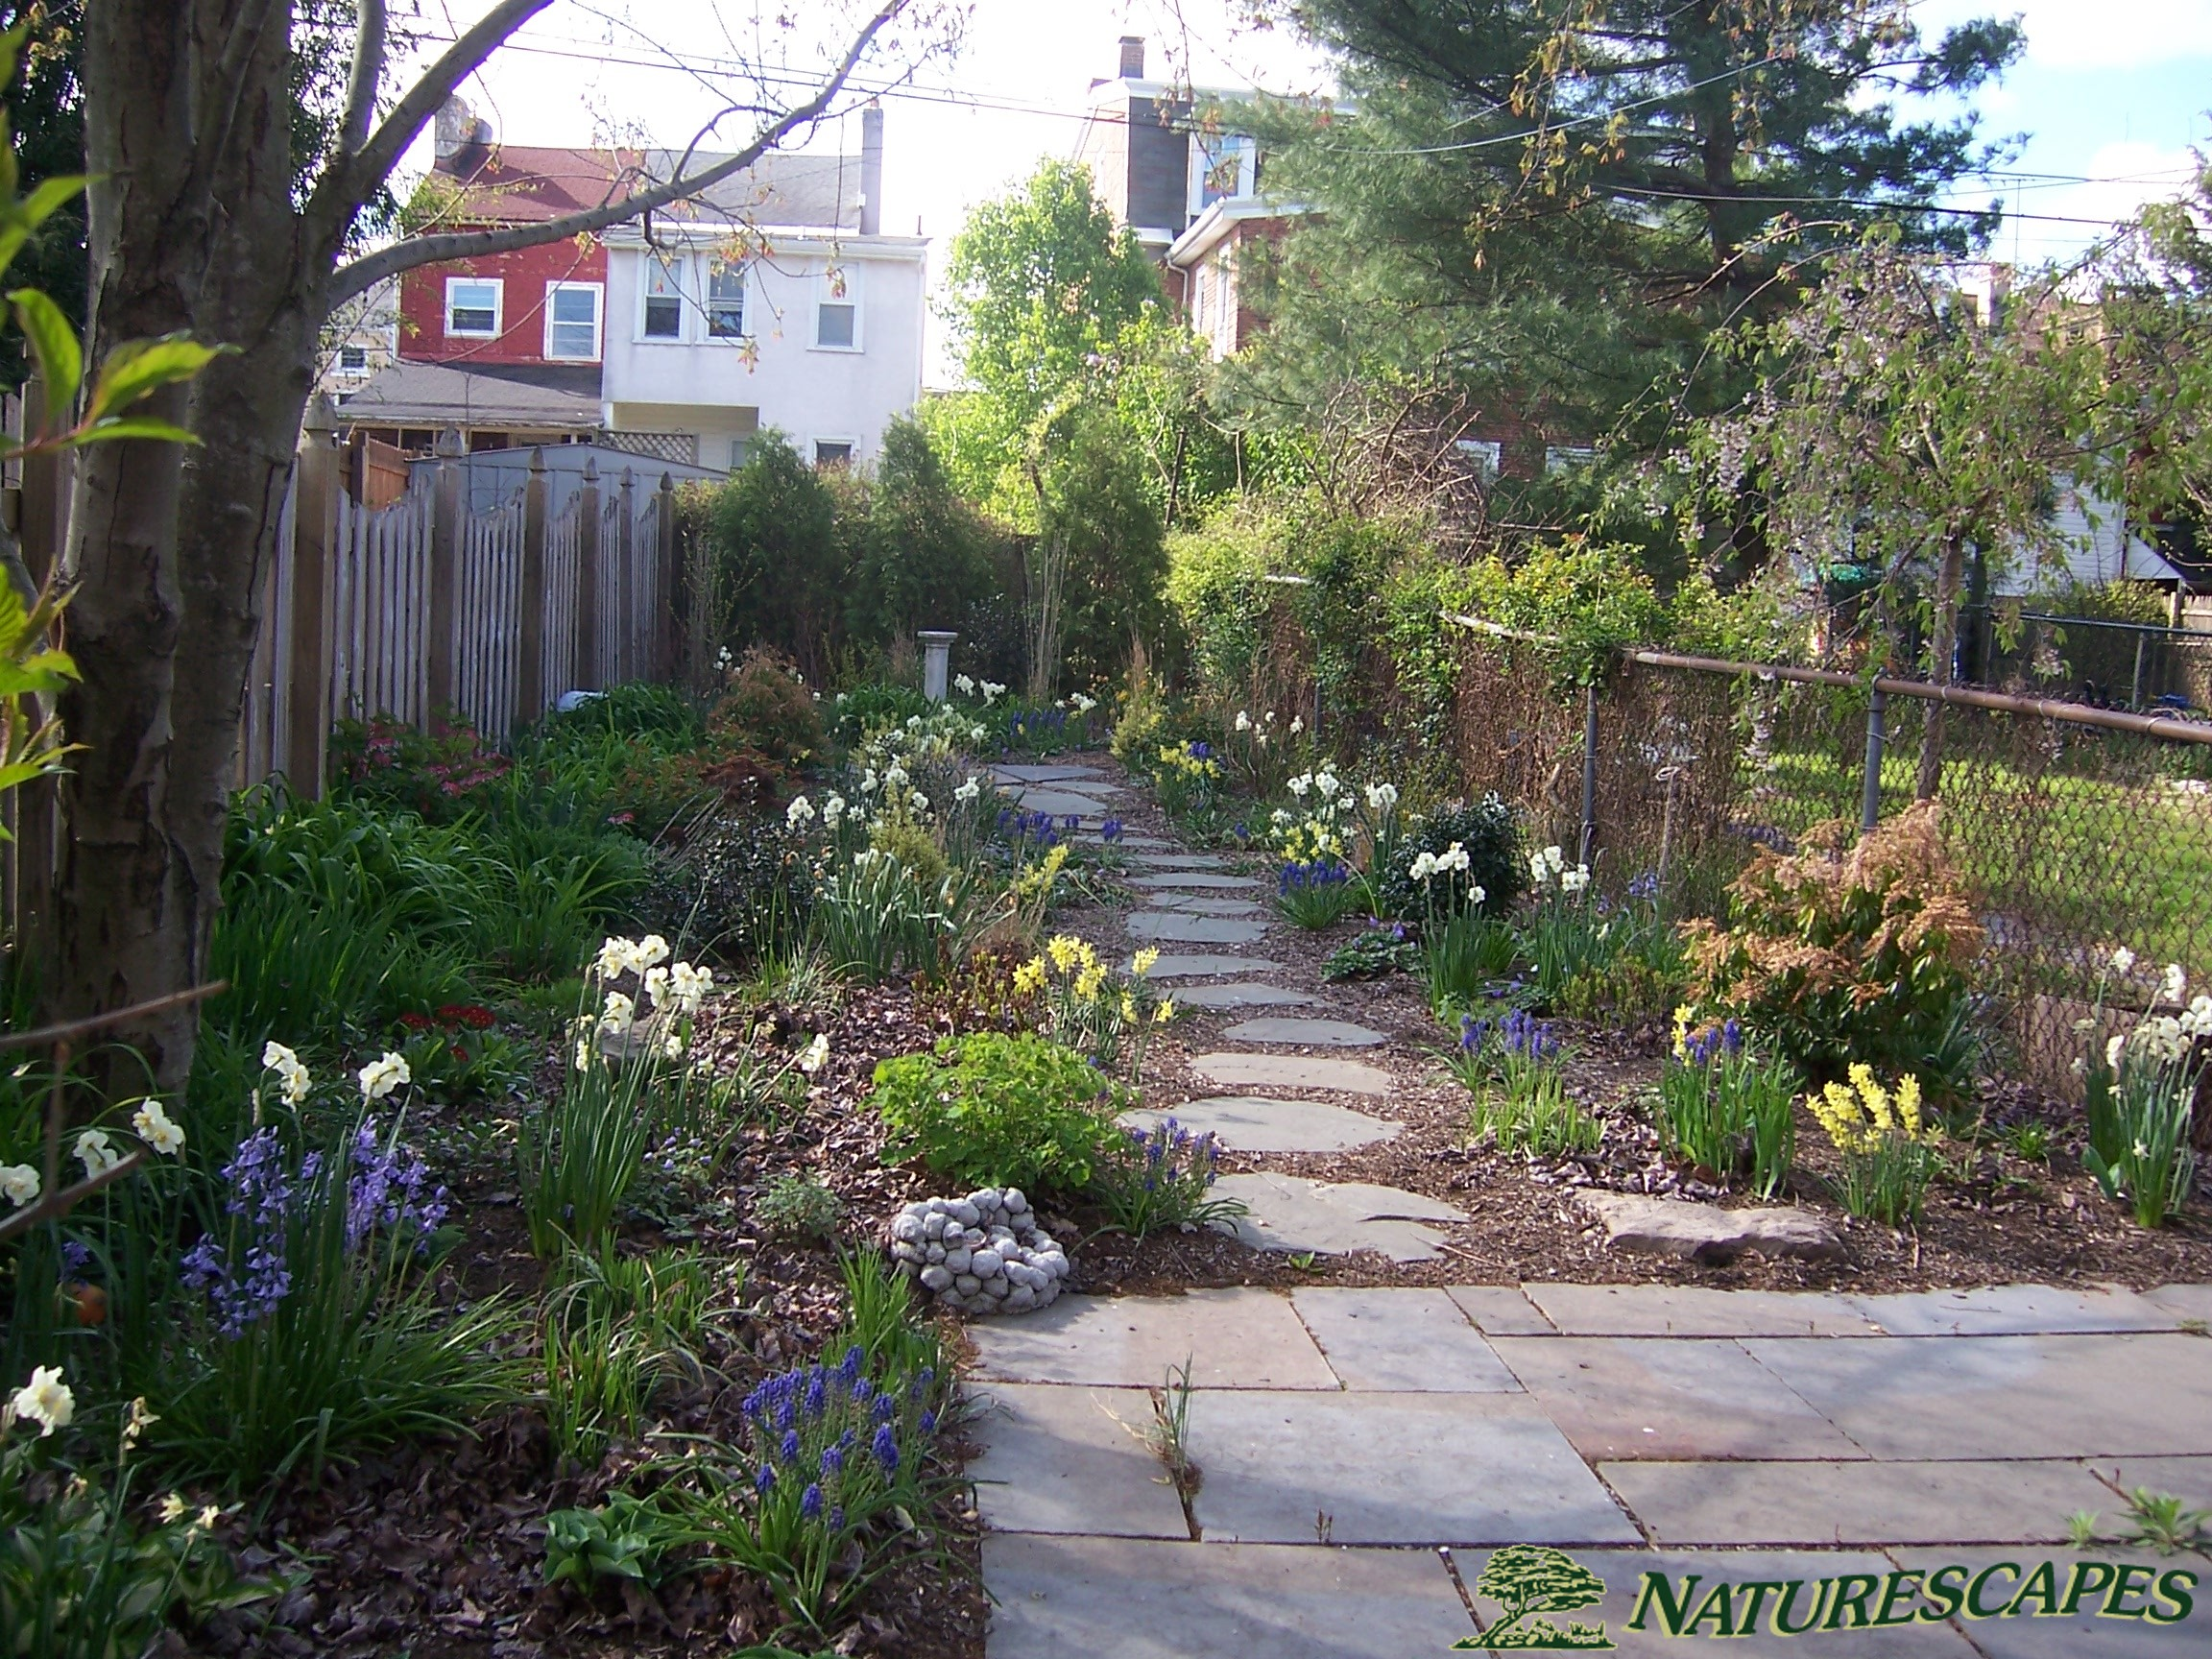 Landscape Design in Phoenixville, PA | Naturescapes ... on No Grass Garden Ideas  id=72961